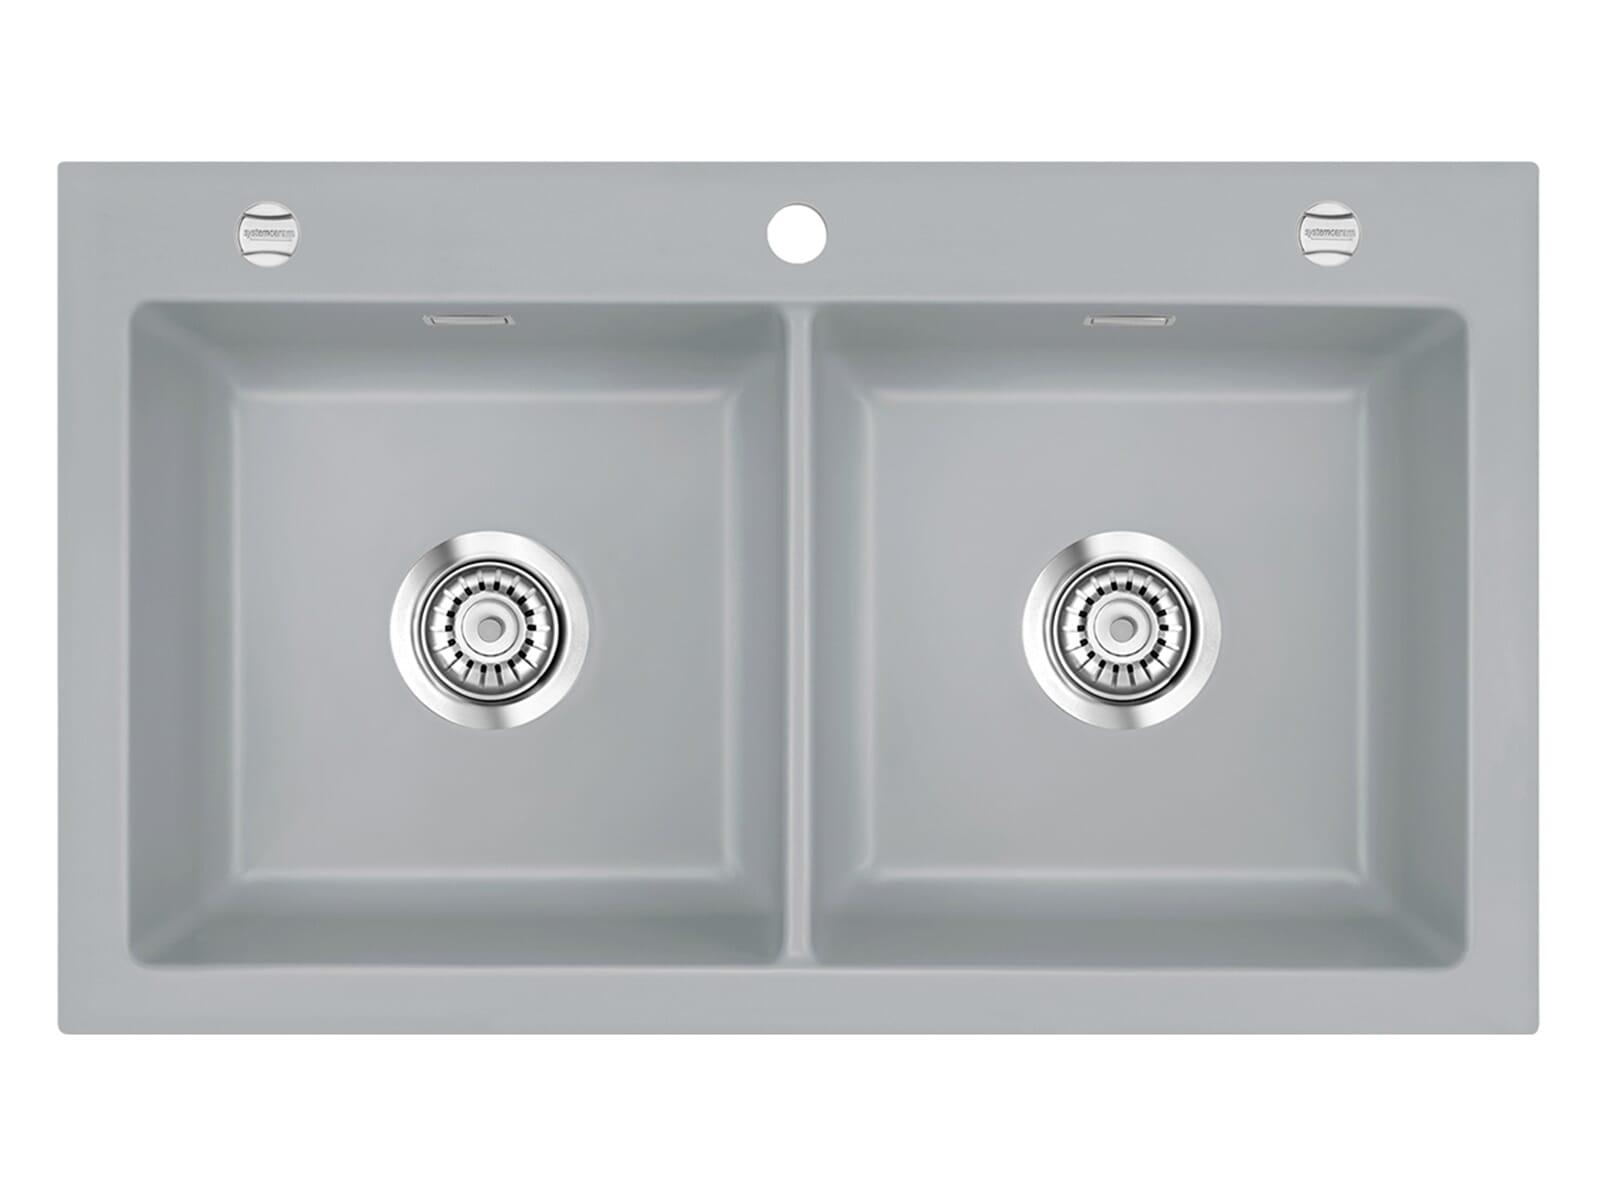 Systemceram Mera Twin Titan Keramikspüle Excenterbetätigung